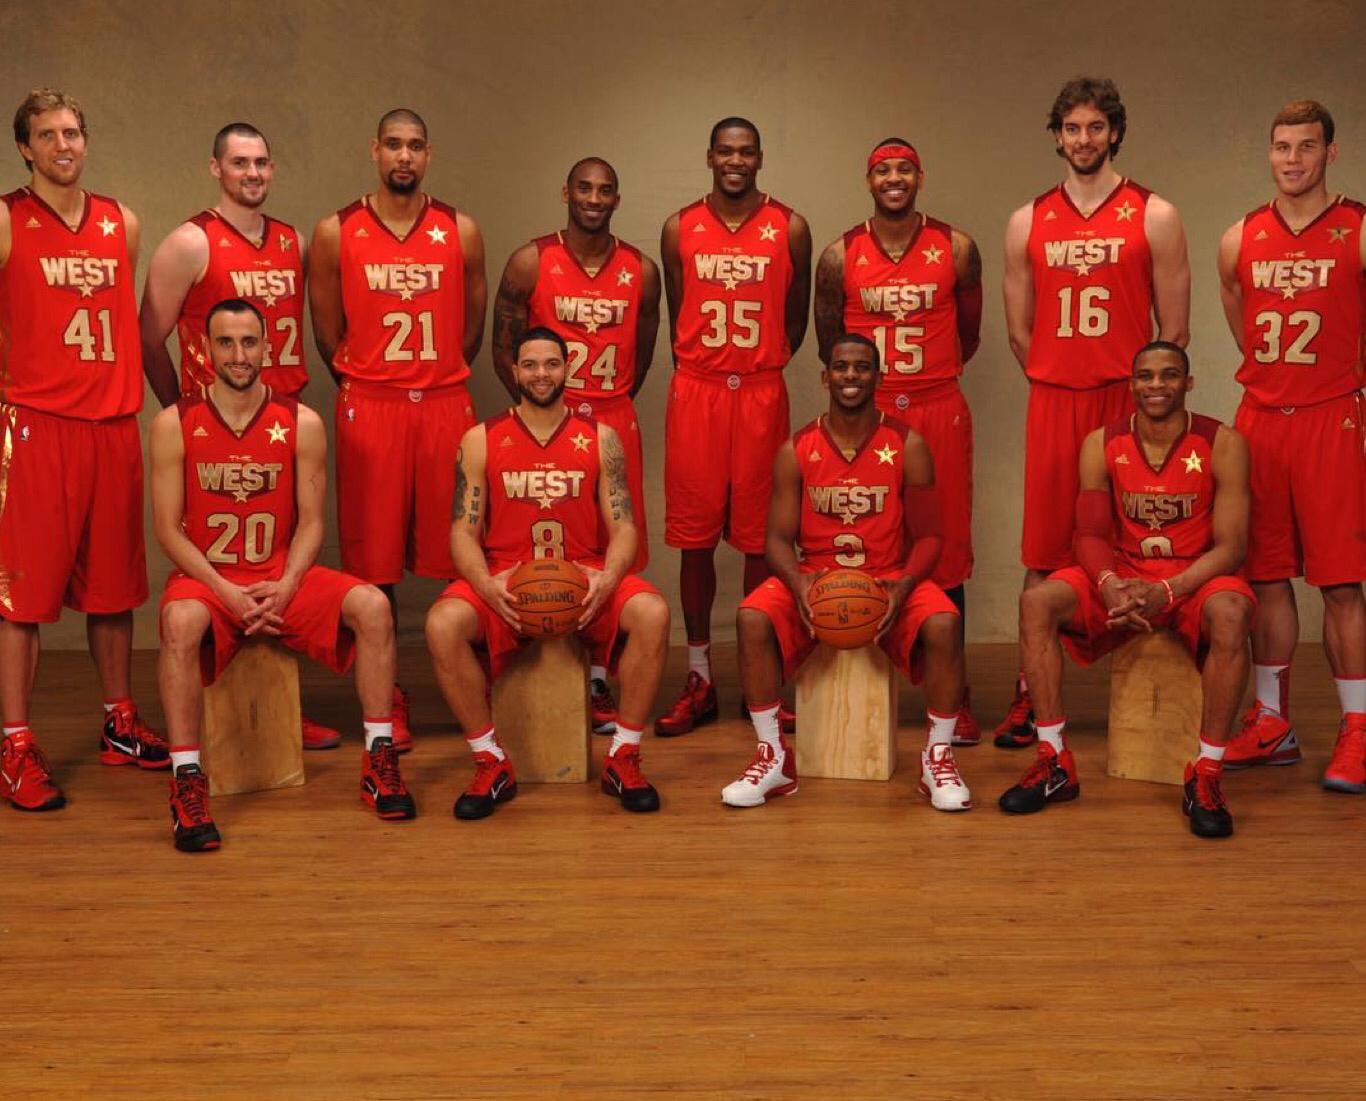 qq明星足球经理_SLAM晒2011年西部全明星合照:选出5位首发_虎扑NBA新闻